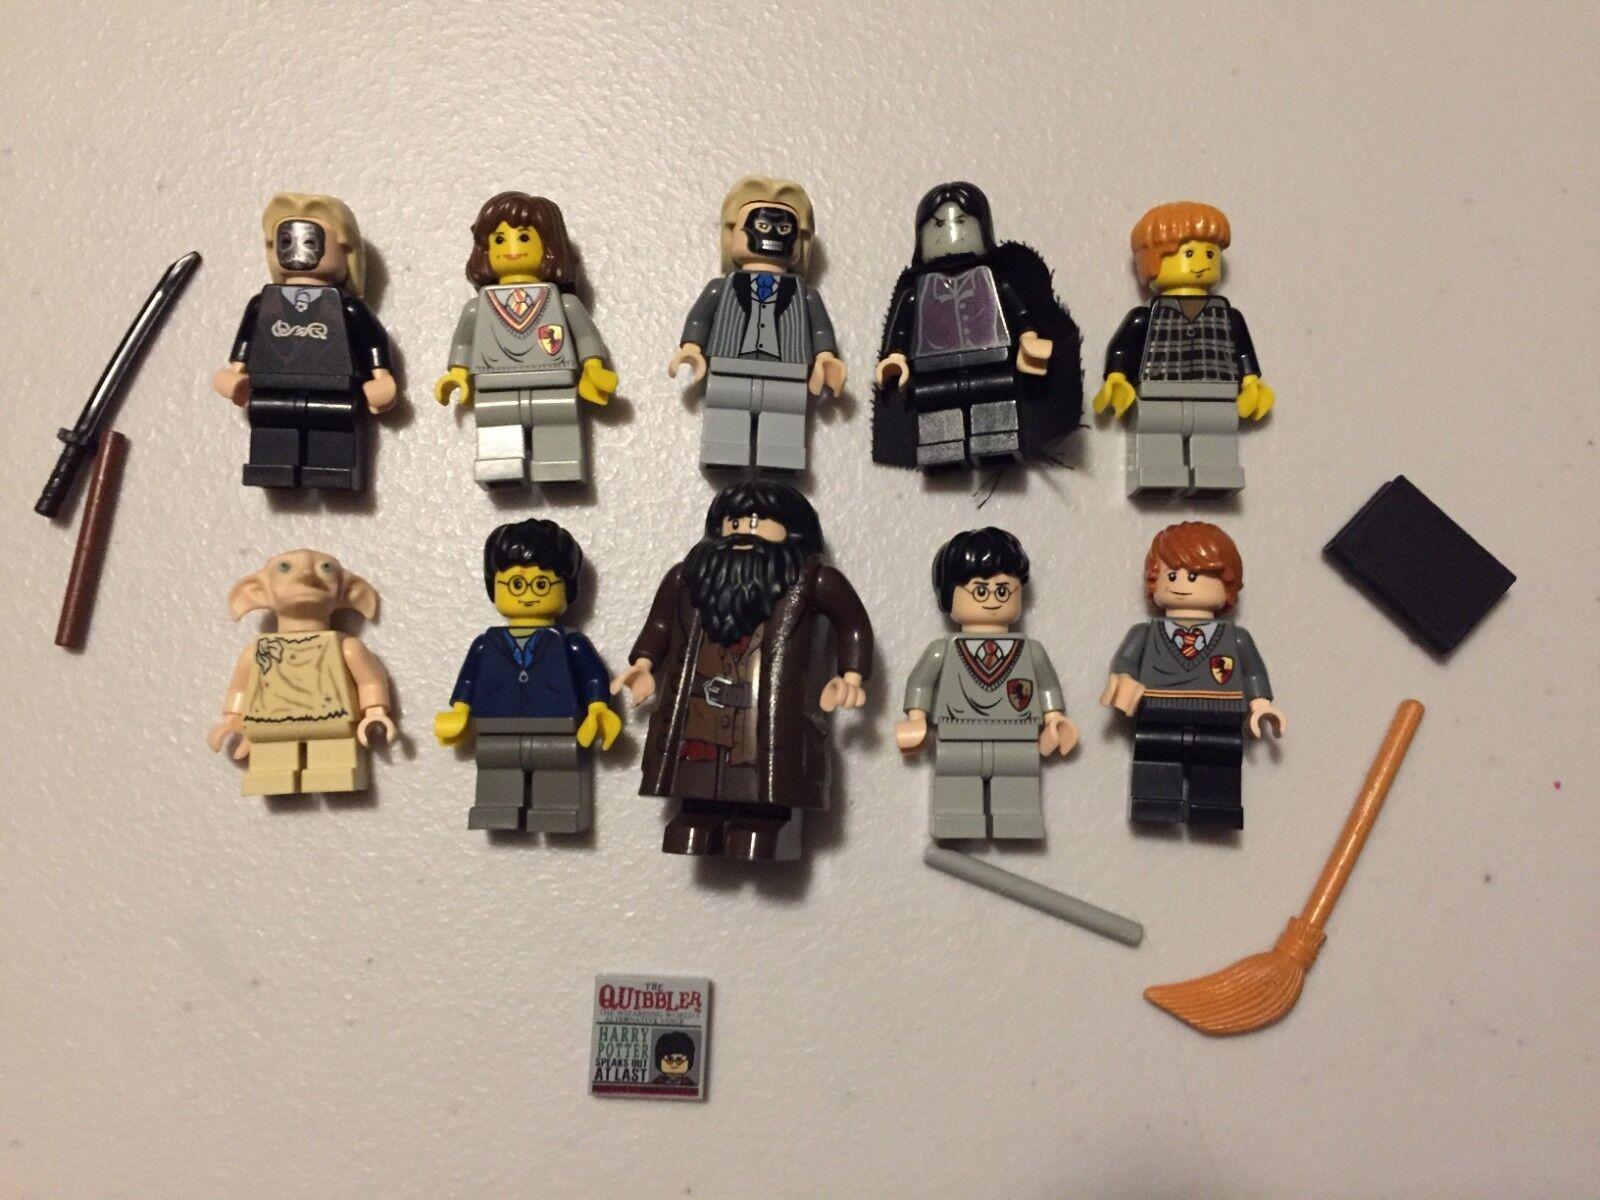 LEGO Harry Potter MINIFIG LOT of 10 MINIFIGS Dobby Draco Lot t496B